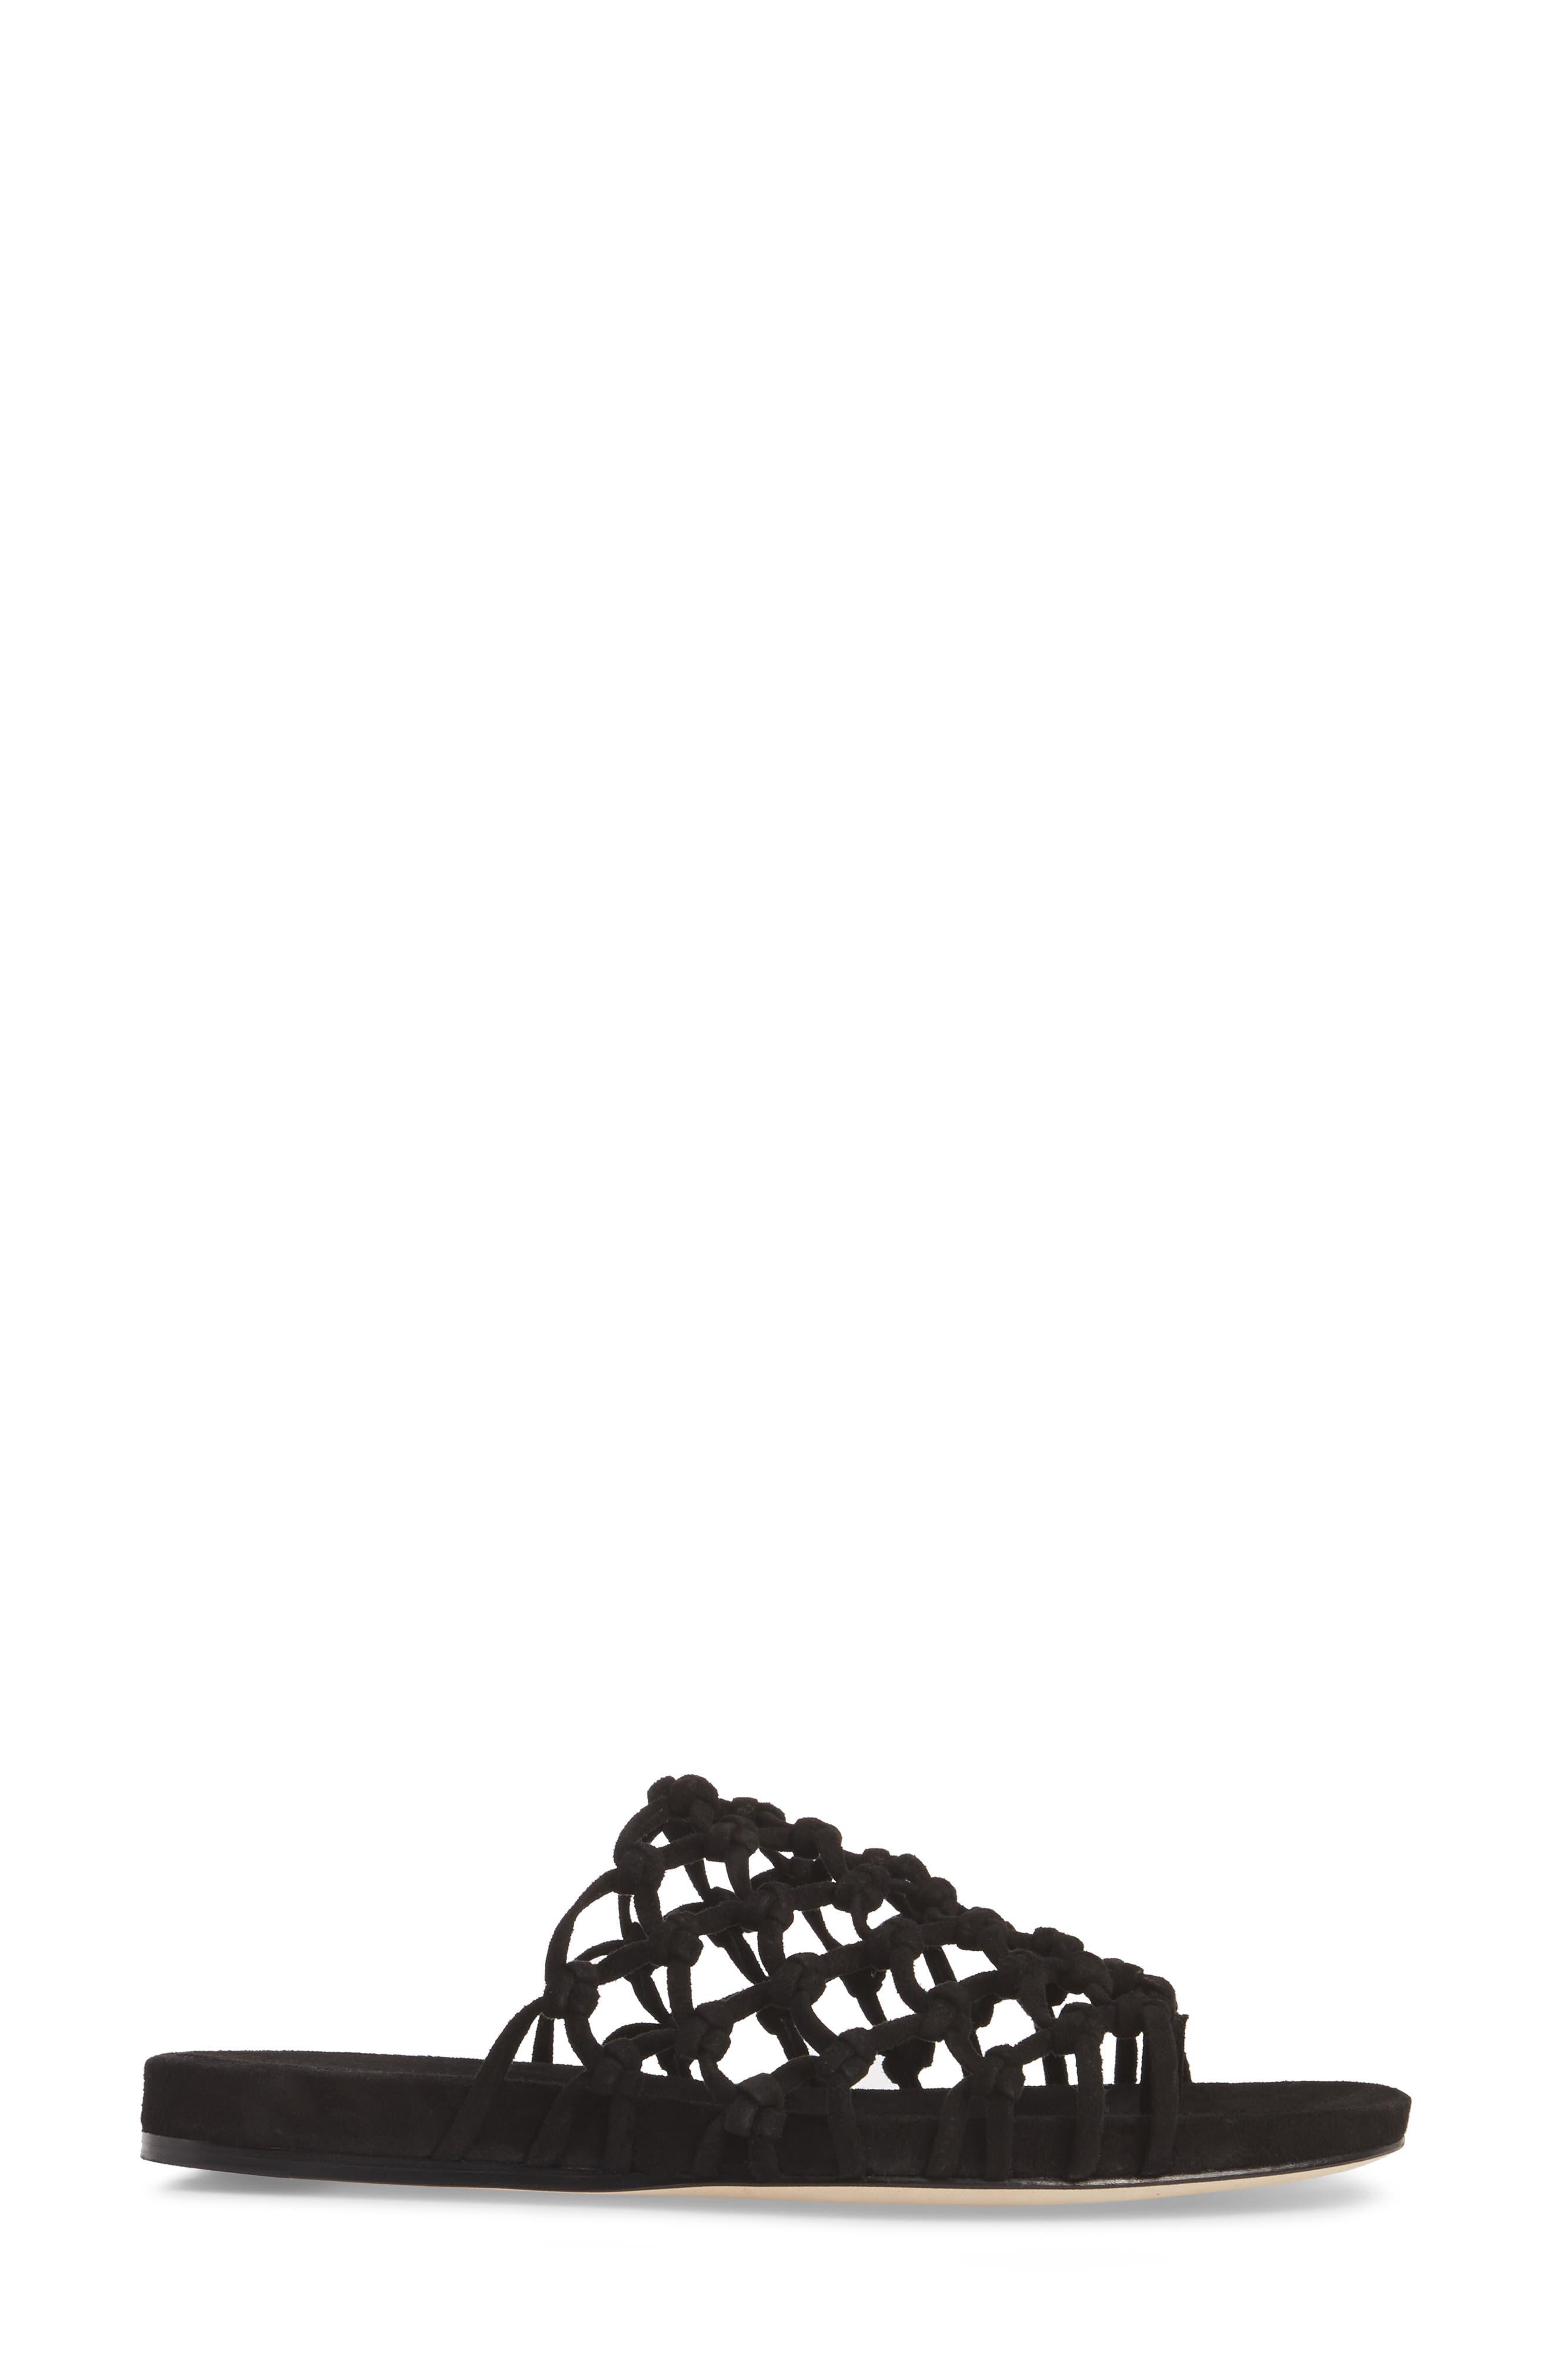 Aruba Slide Sandal,                             Alternate thumbnail 3, color,                             Black Suede